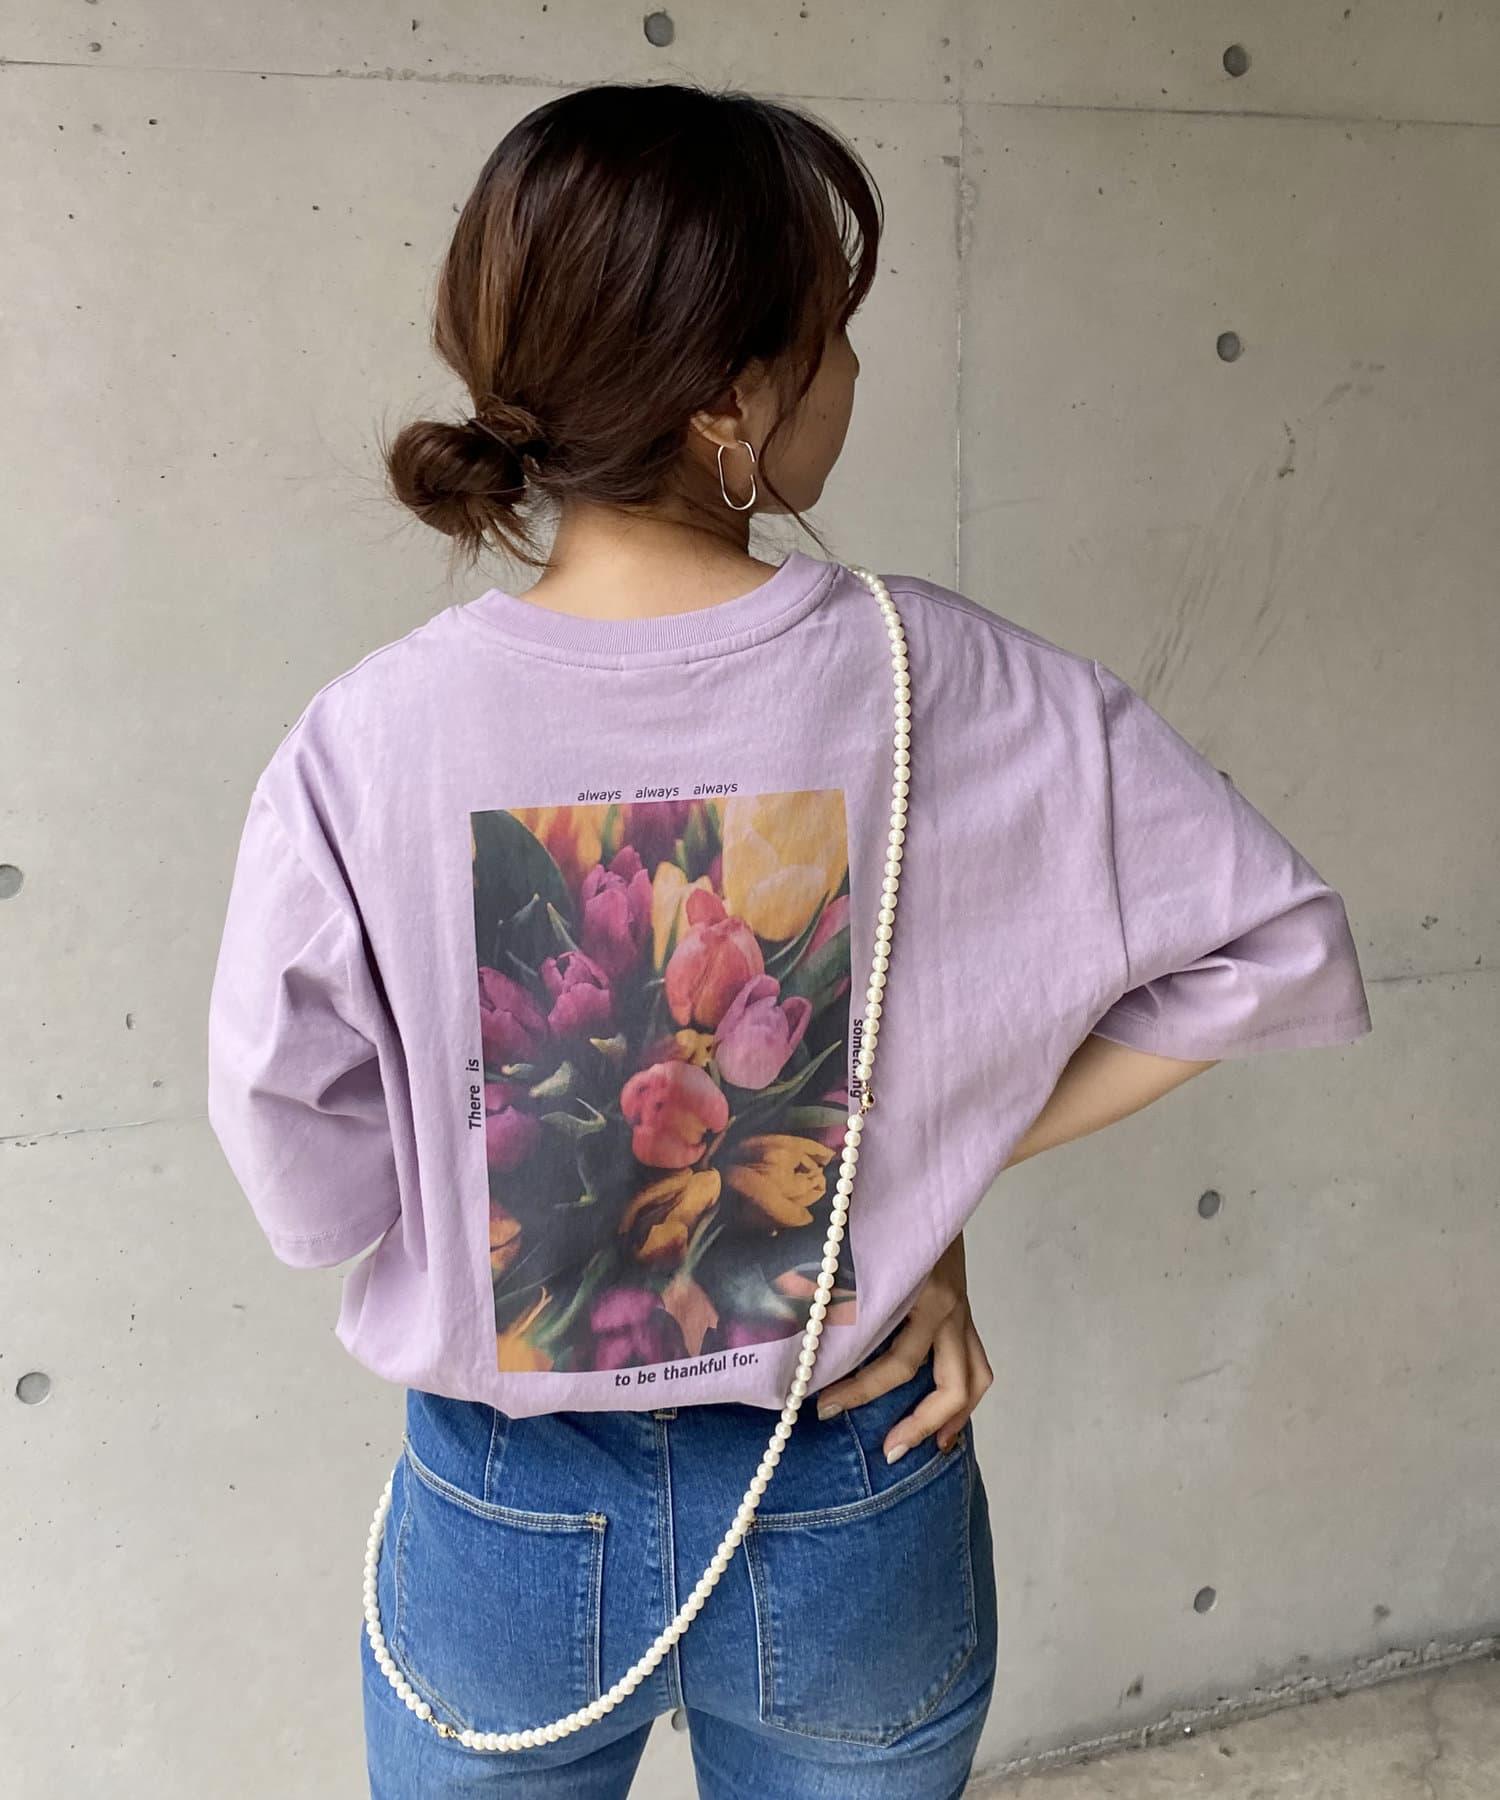 CAPRICIEUX LE'MAGE(カプリシュレマージュ) 【SOMETHING/サムシング】フラワーTシャツ